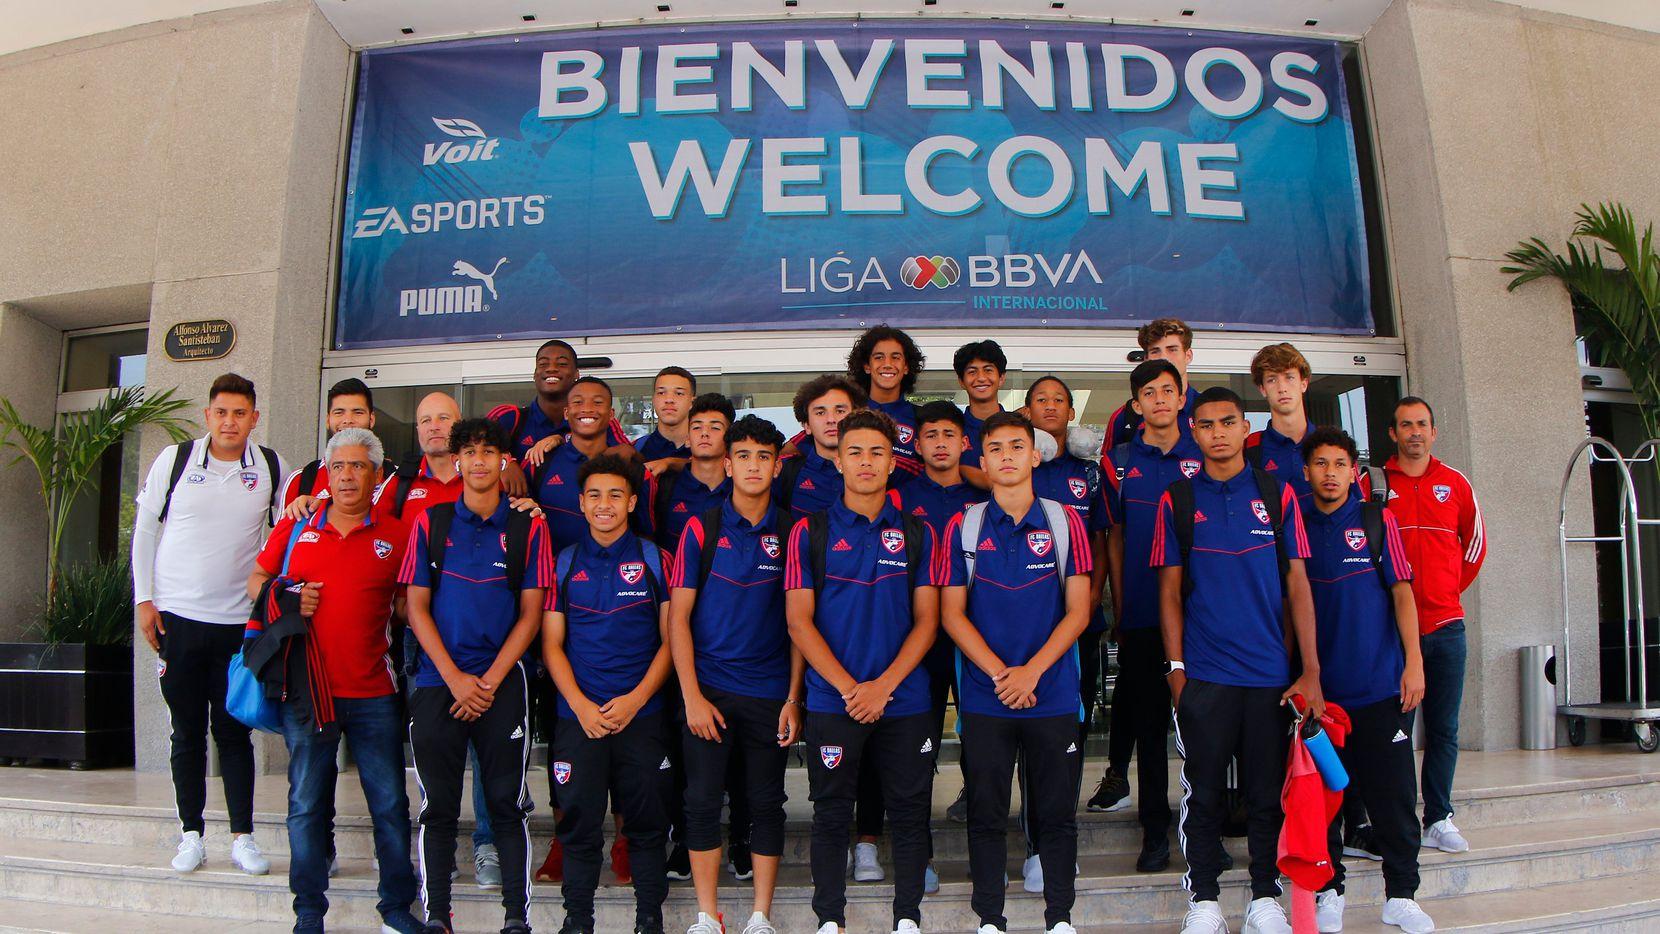 The FC Dallas U17s arrive in Mexico City to take part in the 2019 Liga MX Sub International Tournament.